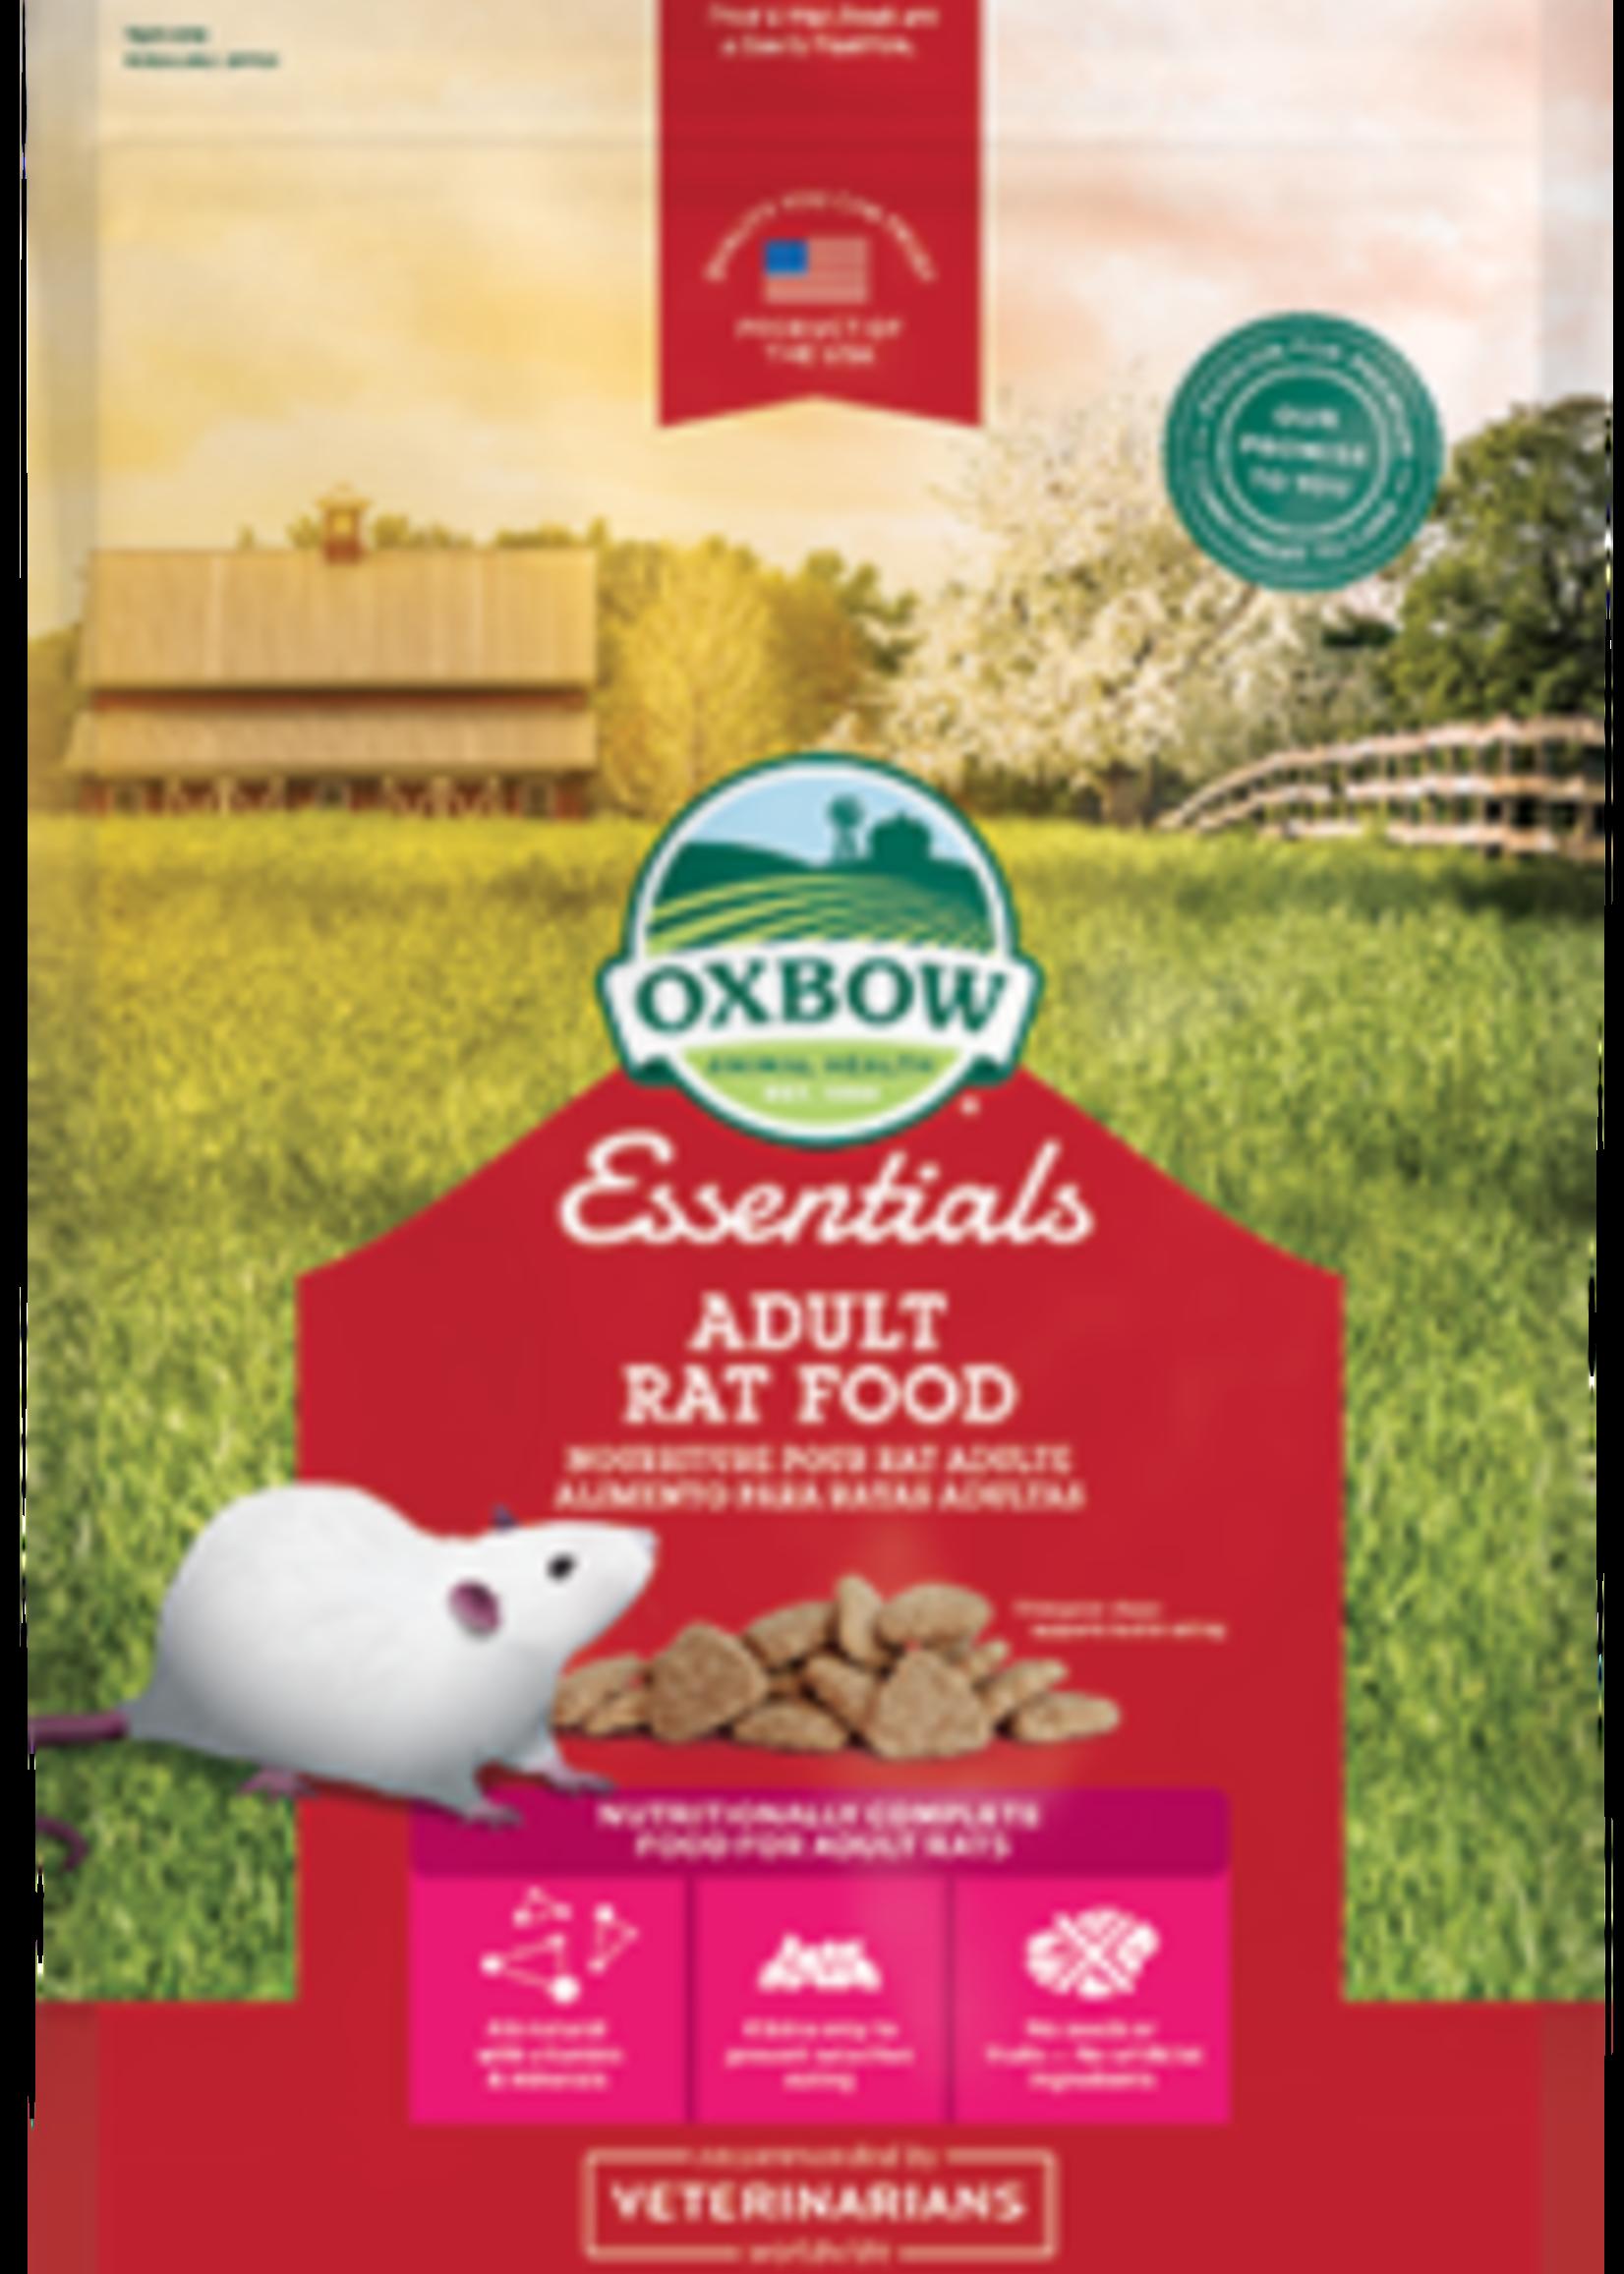 Oxbow Animal Health™ Oxbow Essentials Adult Rat Food 3lbs